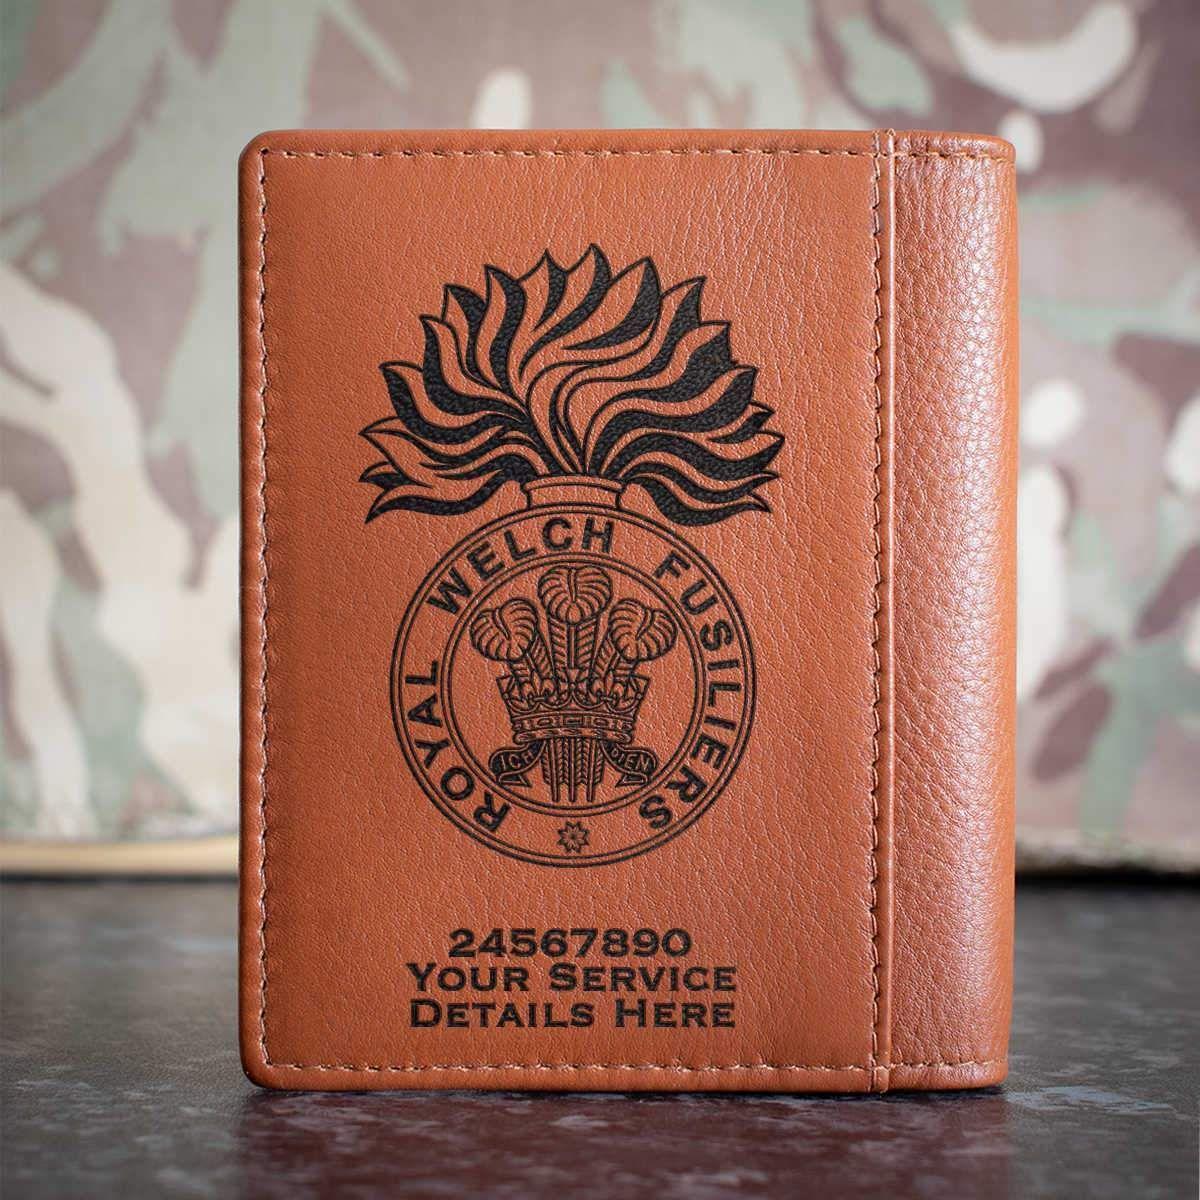 Welches Wallet